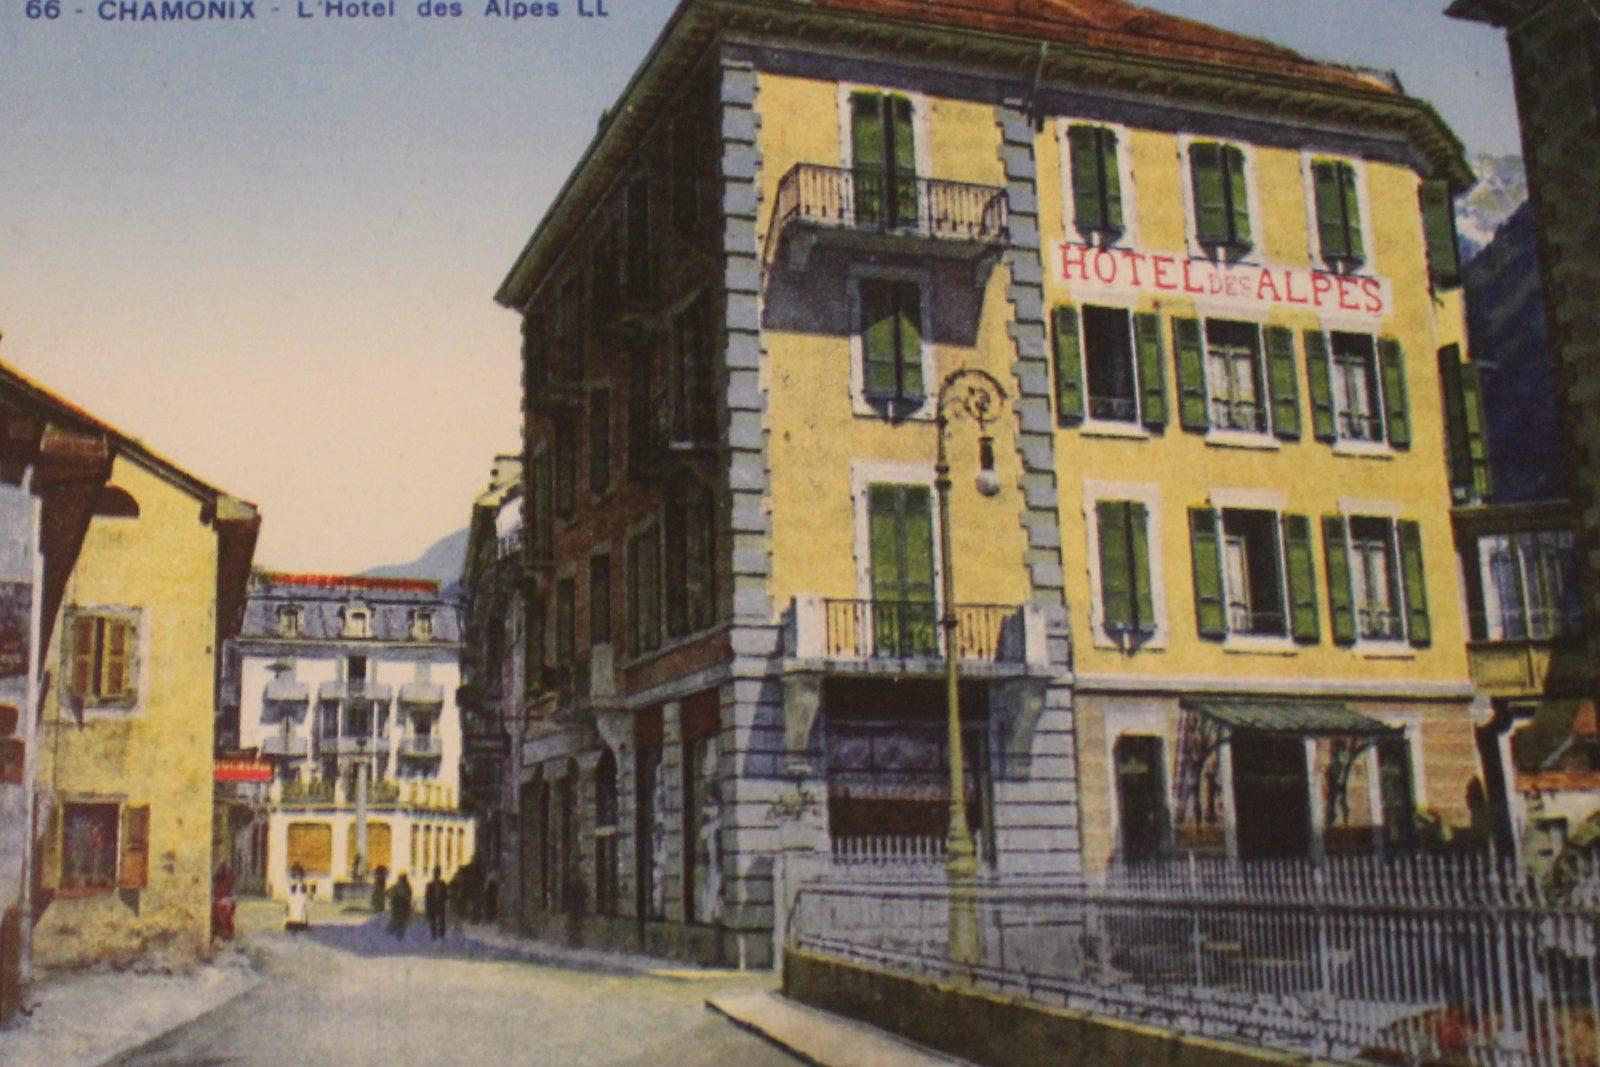 Chamonix hotel des Alpes